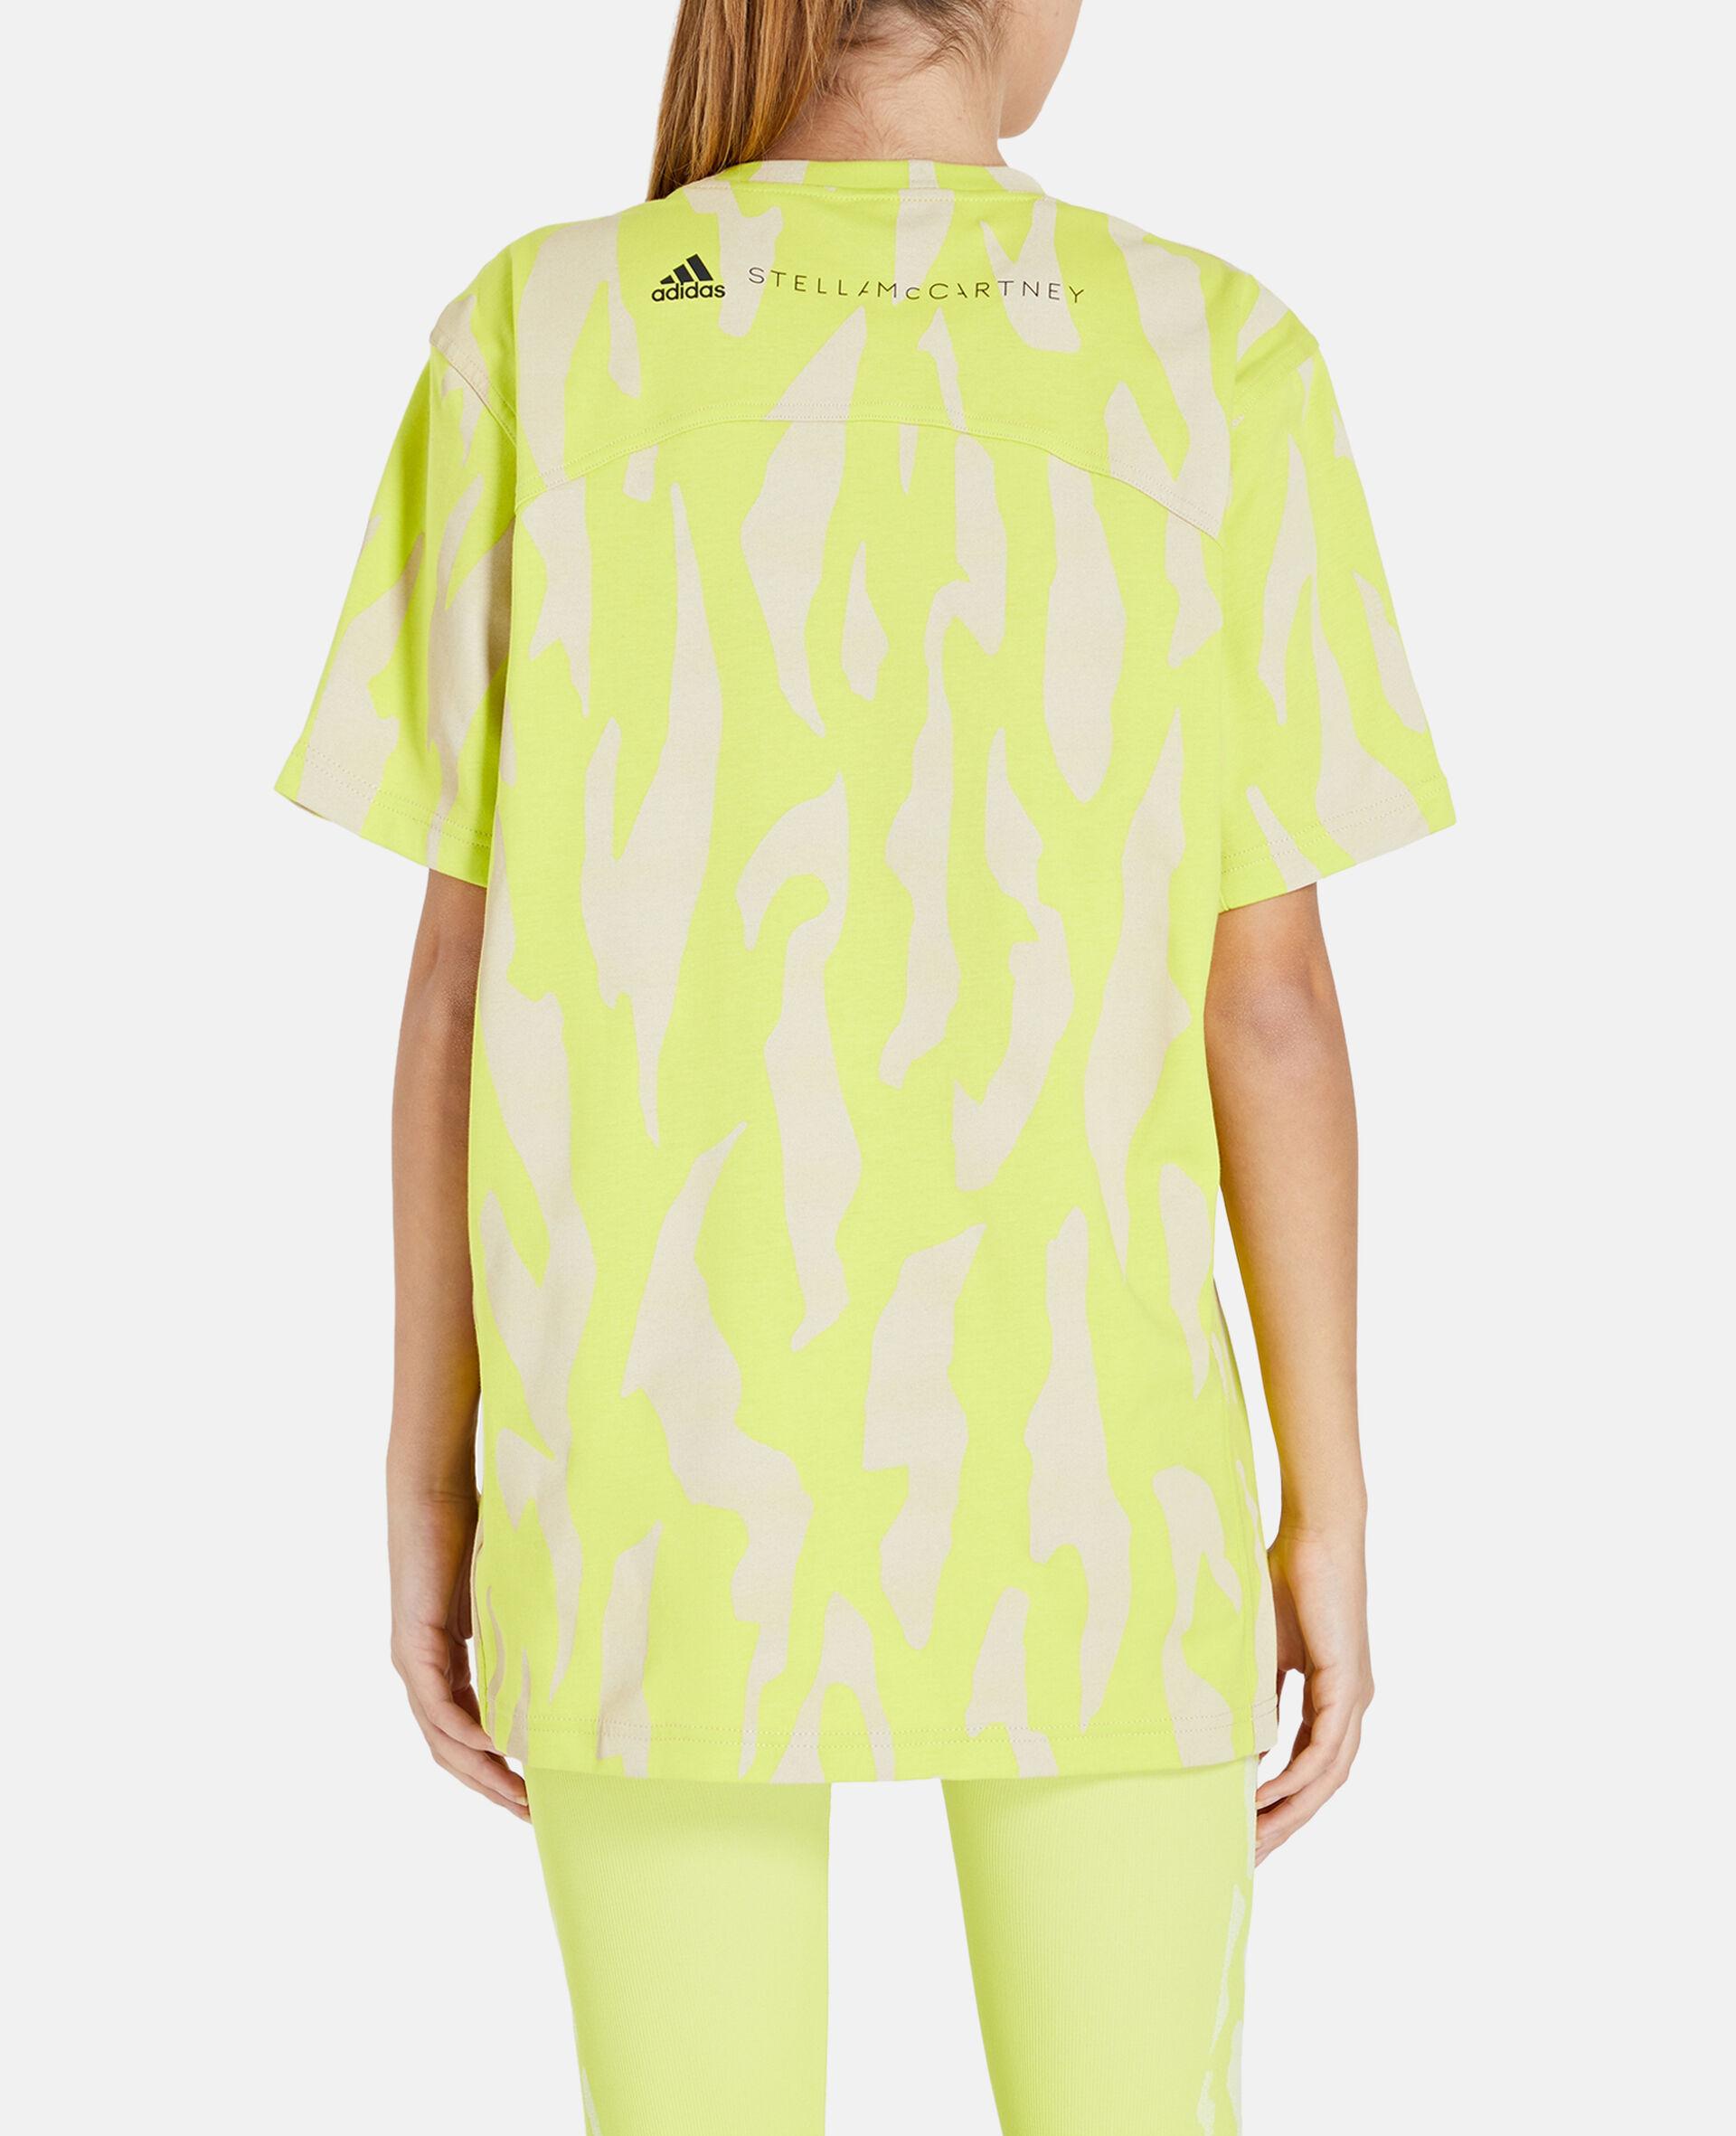 Future Playground T-Shirt-Yellow-large image number 2